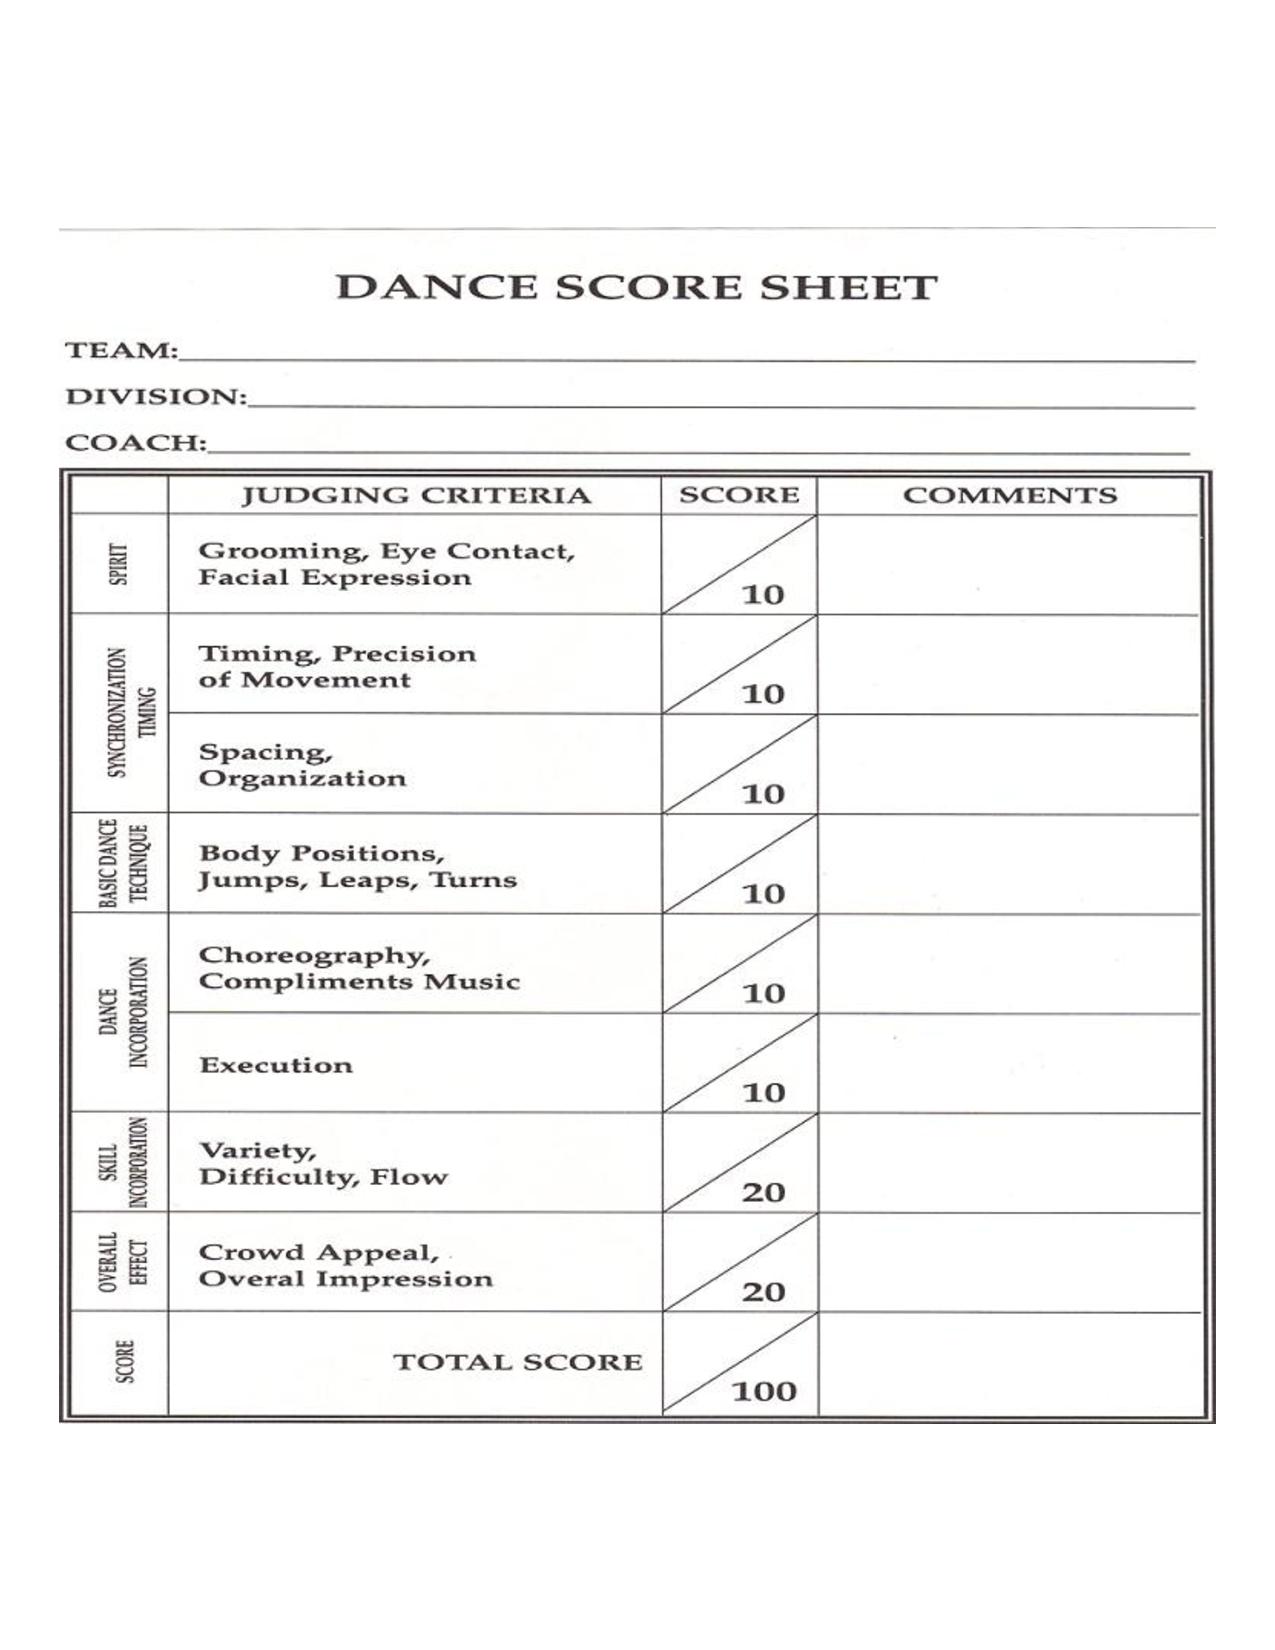 Gbdc Dance Score Sheet